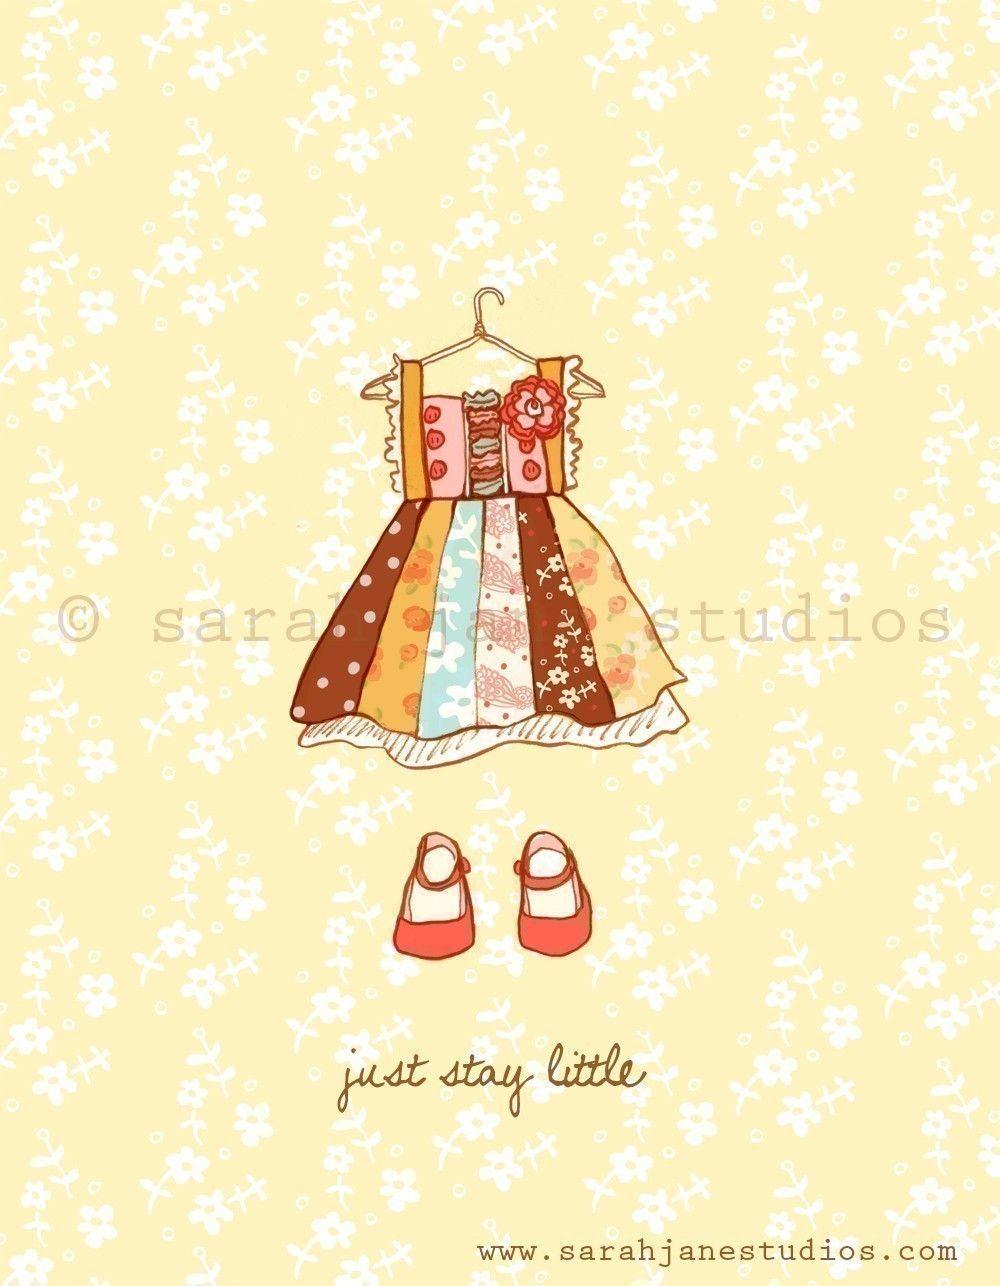 Childrens Wall Art Print - Just Stay Little (Girl) - 8x10 - Girl ...